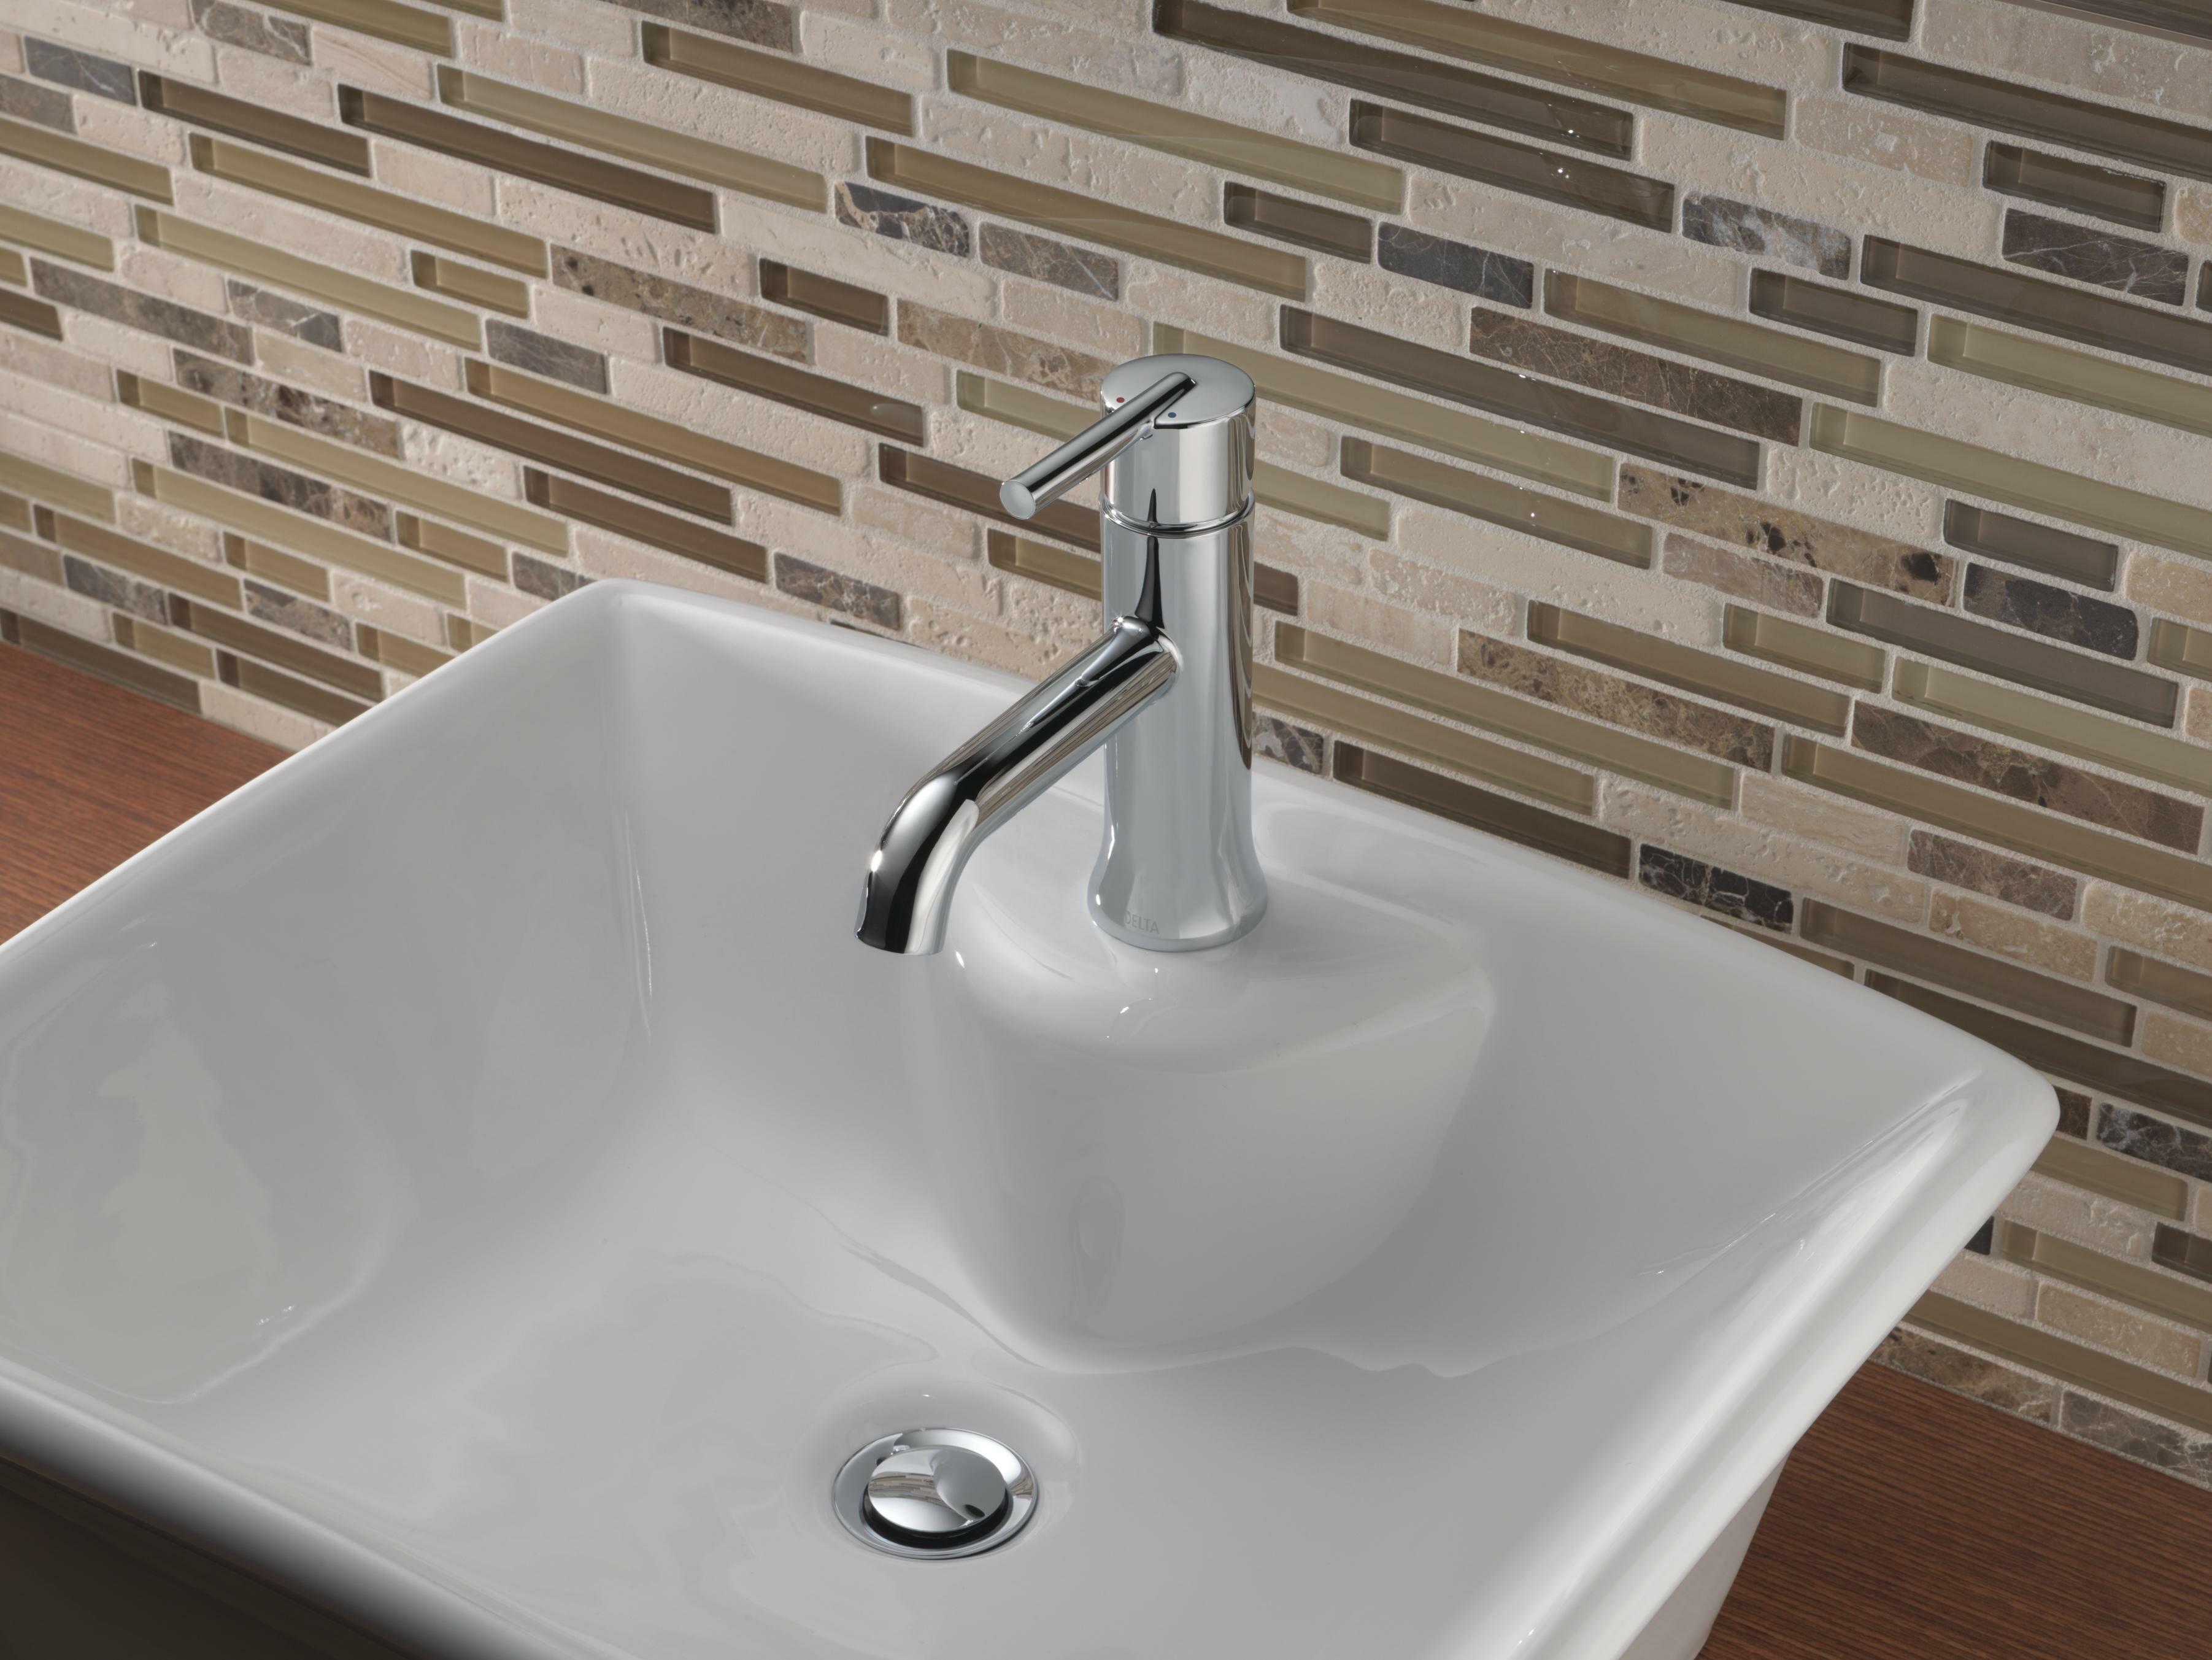 559lf Ssmpu Mpu Czmpu Delta Trinsic Single Hole Bathroom Faucet